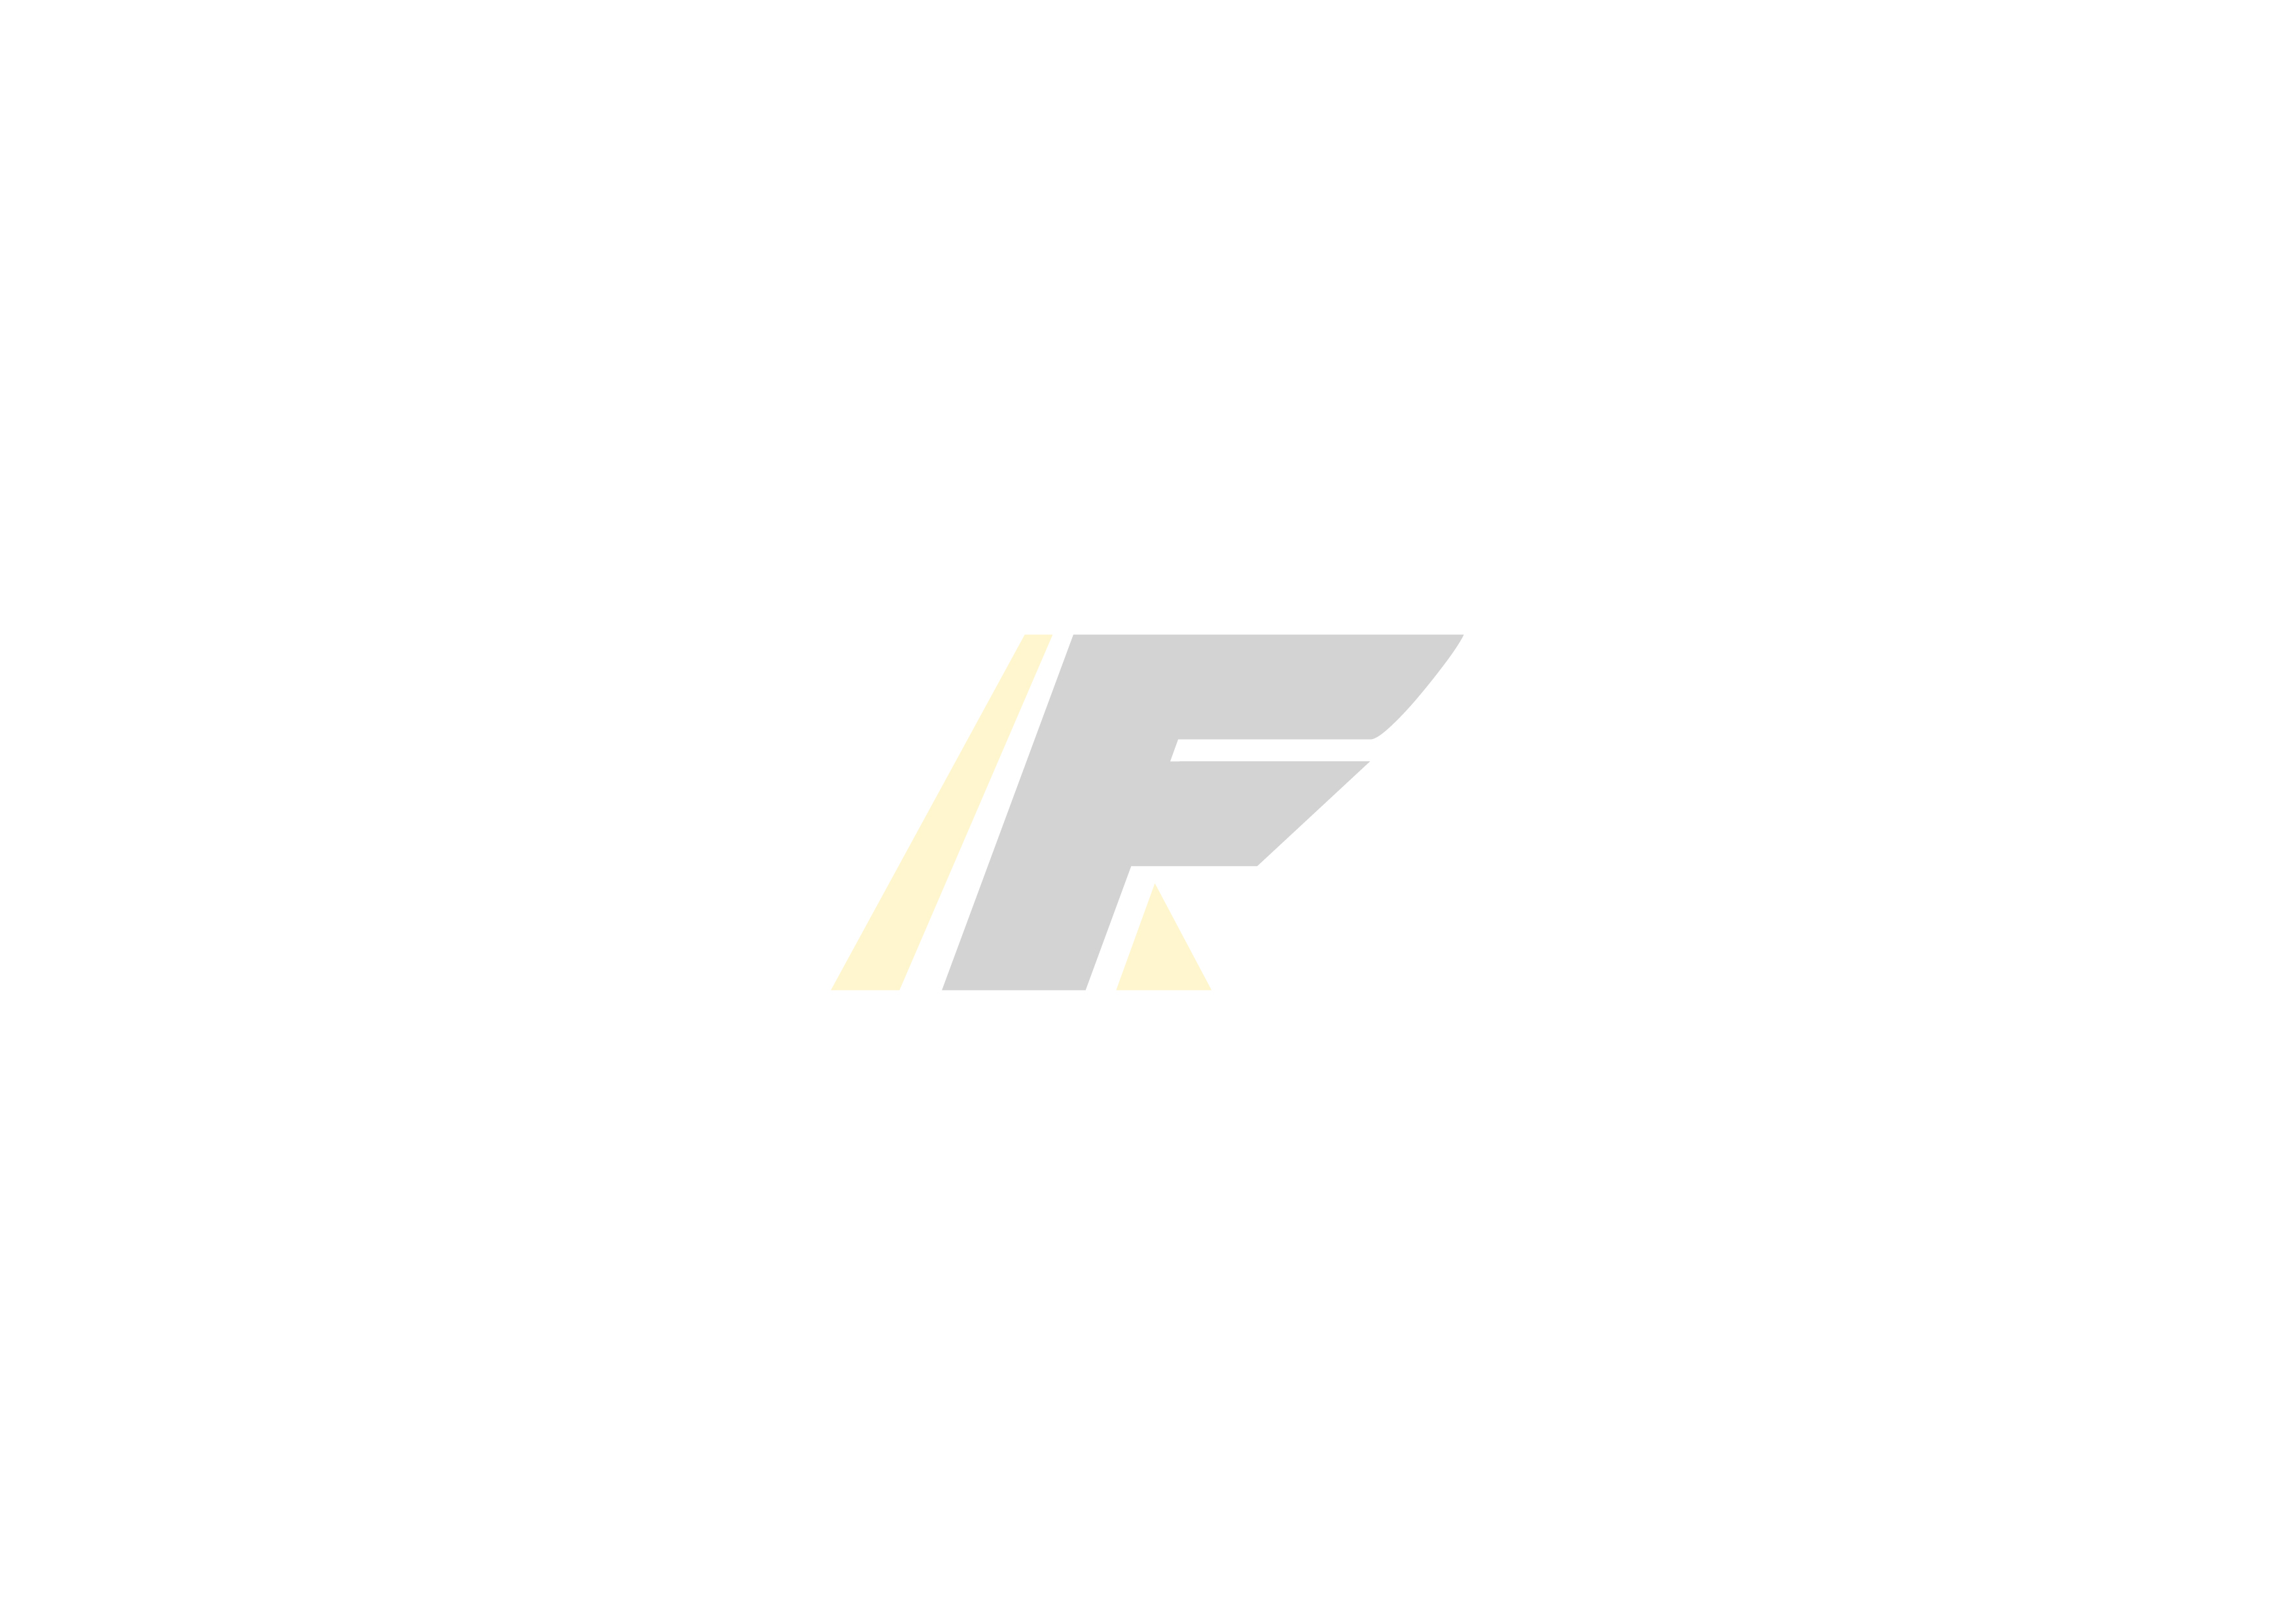 Dunlop - KT345 Quad Competition Radial